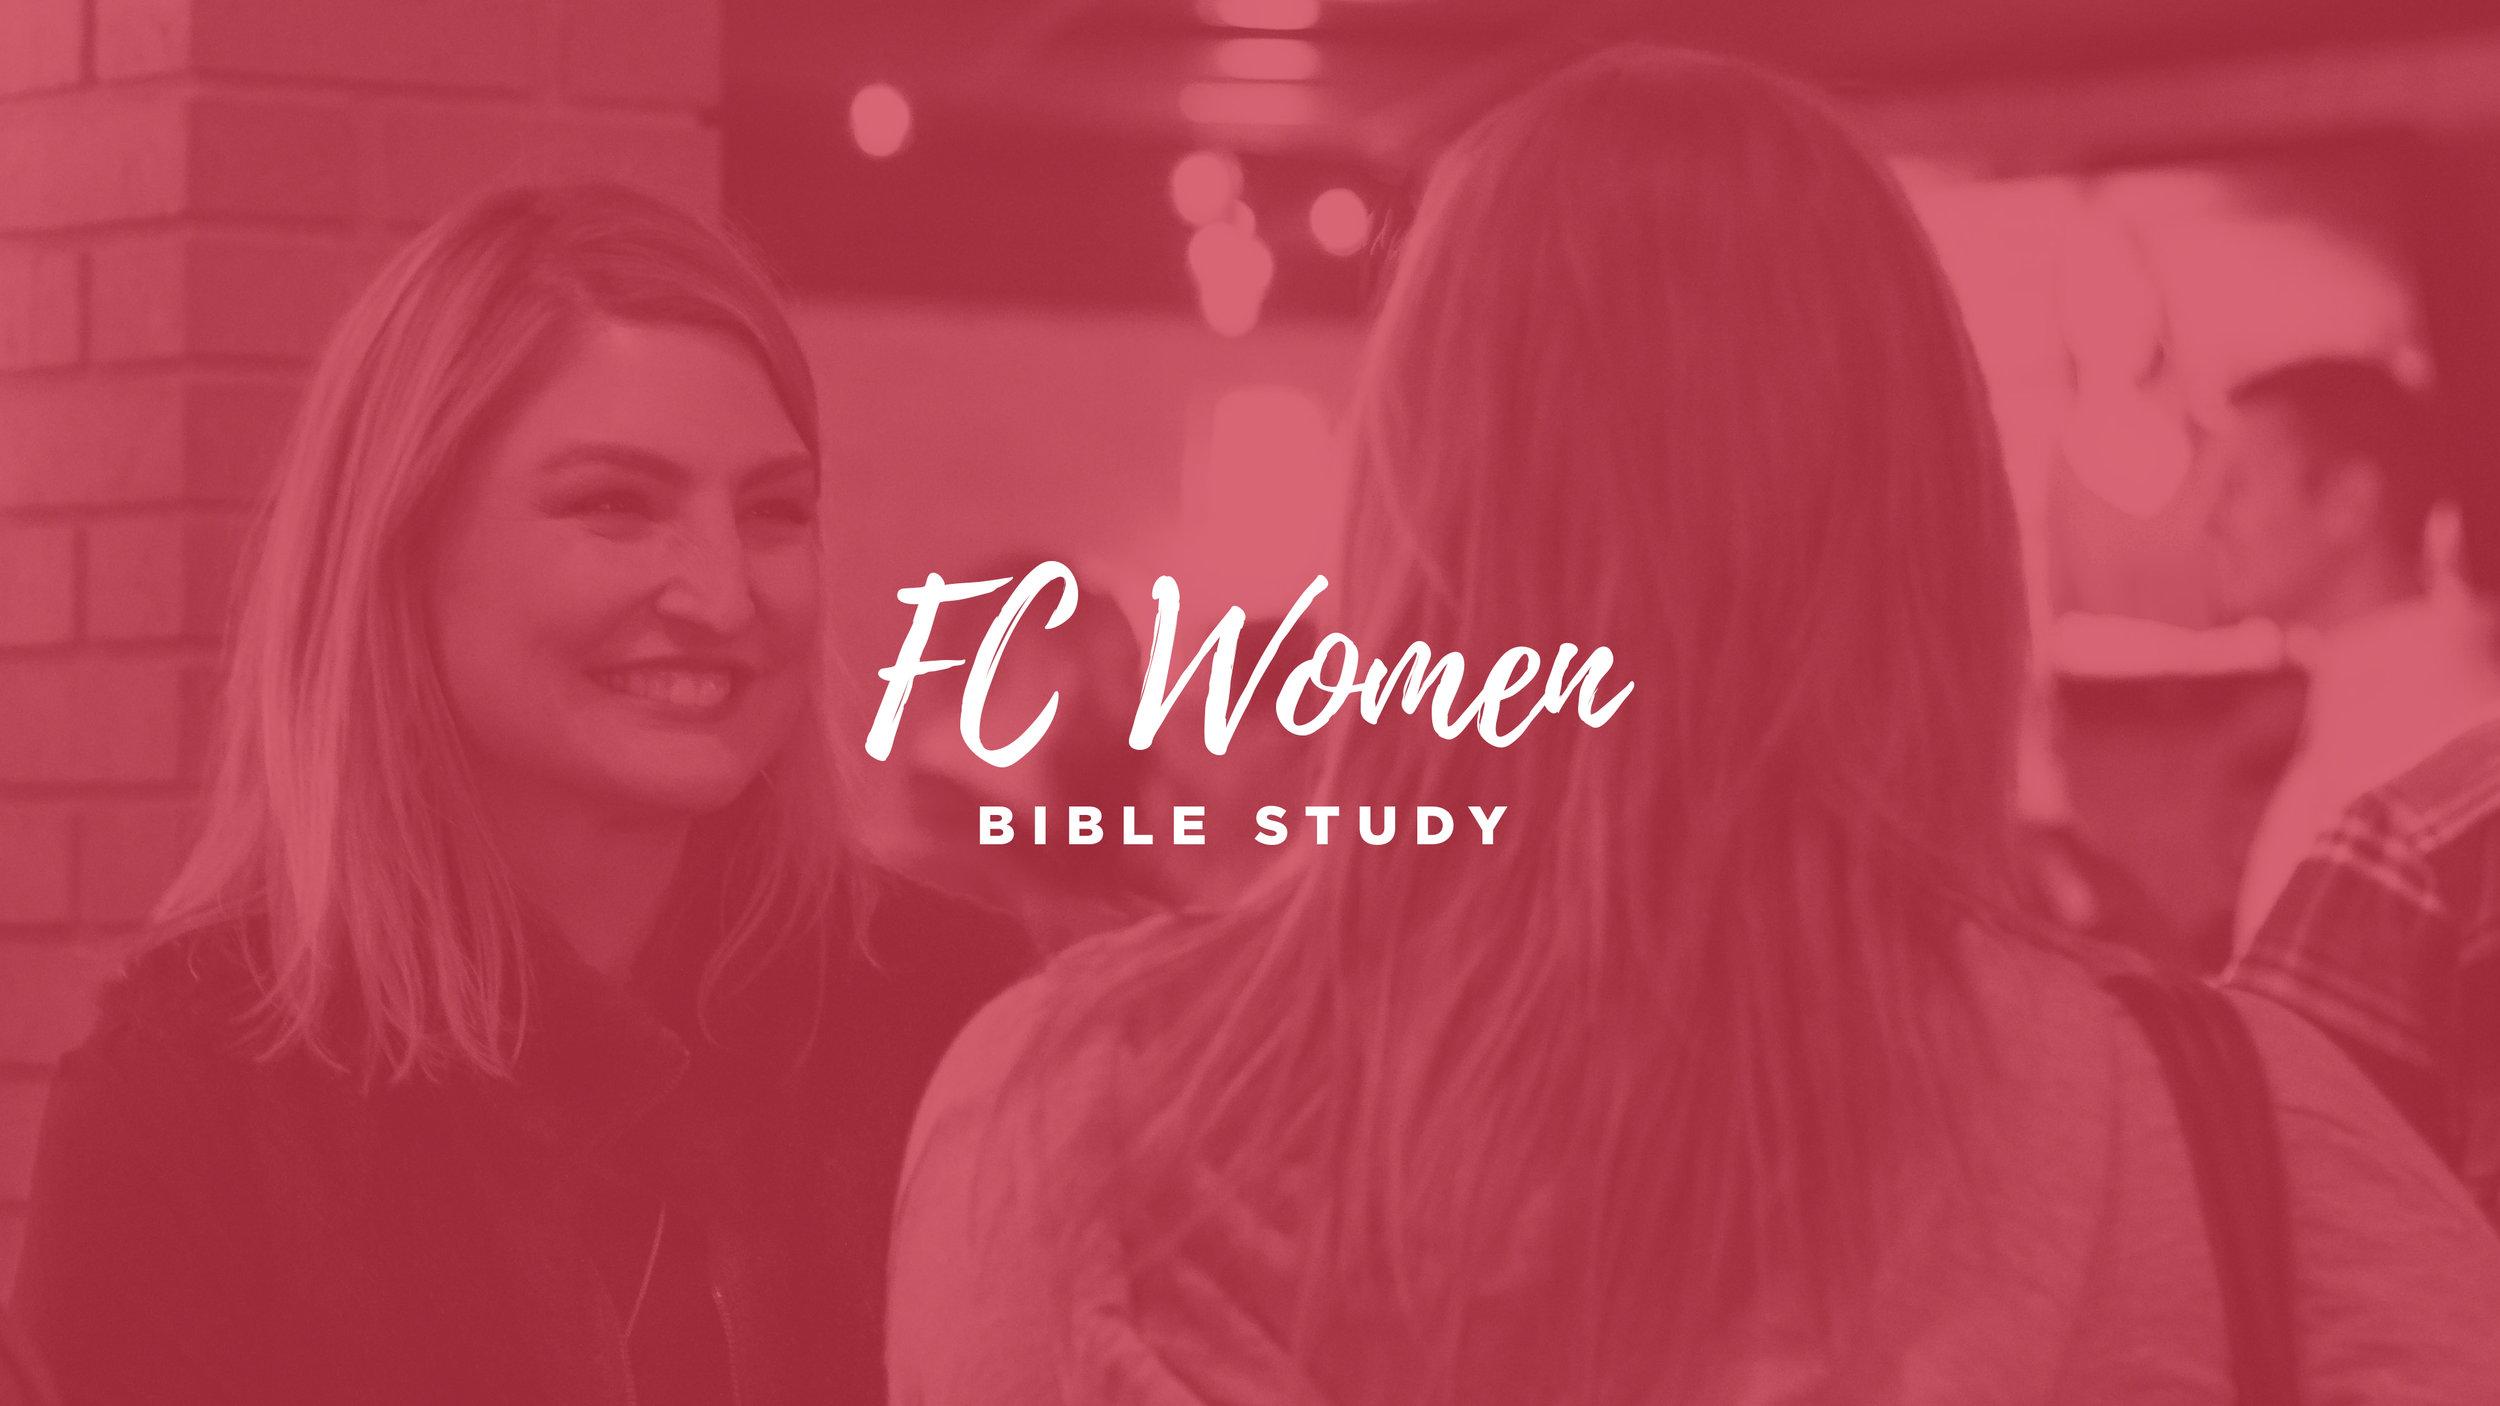 fc women bible study 2018.jpg